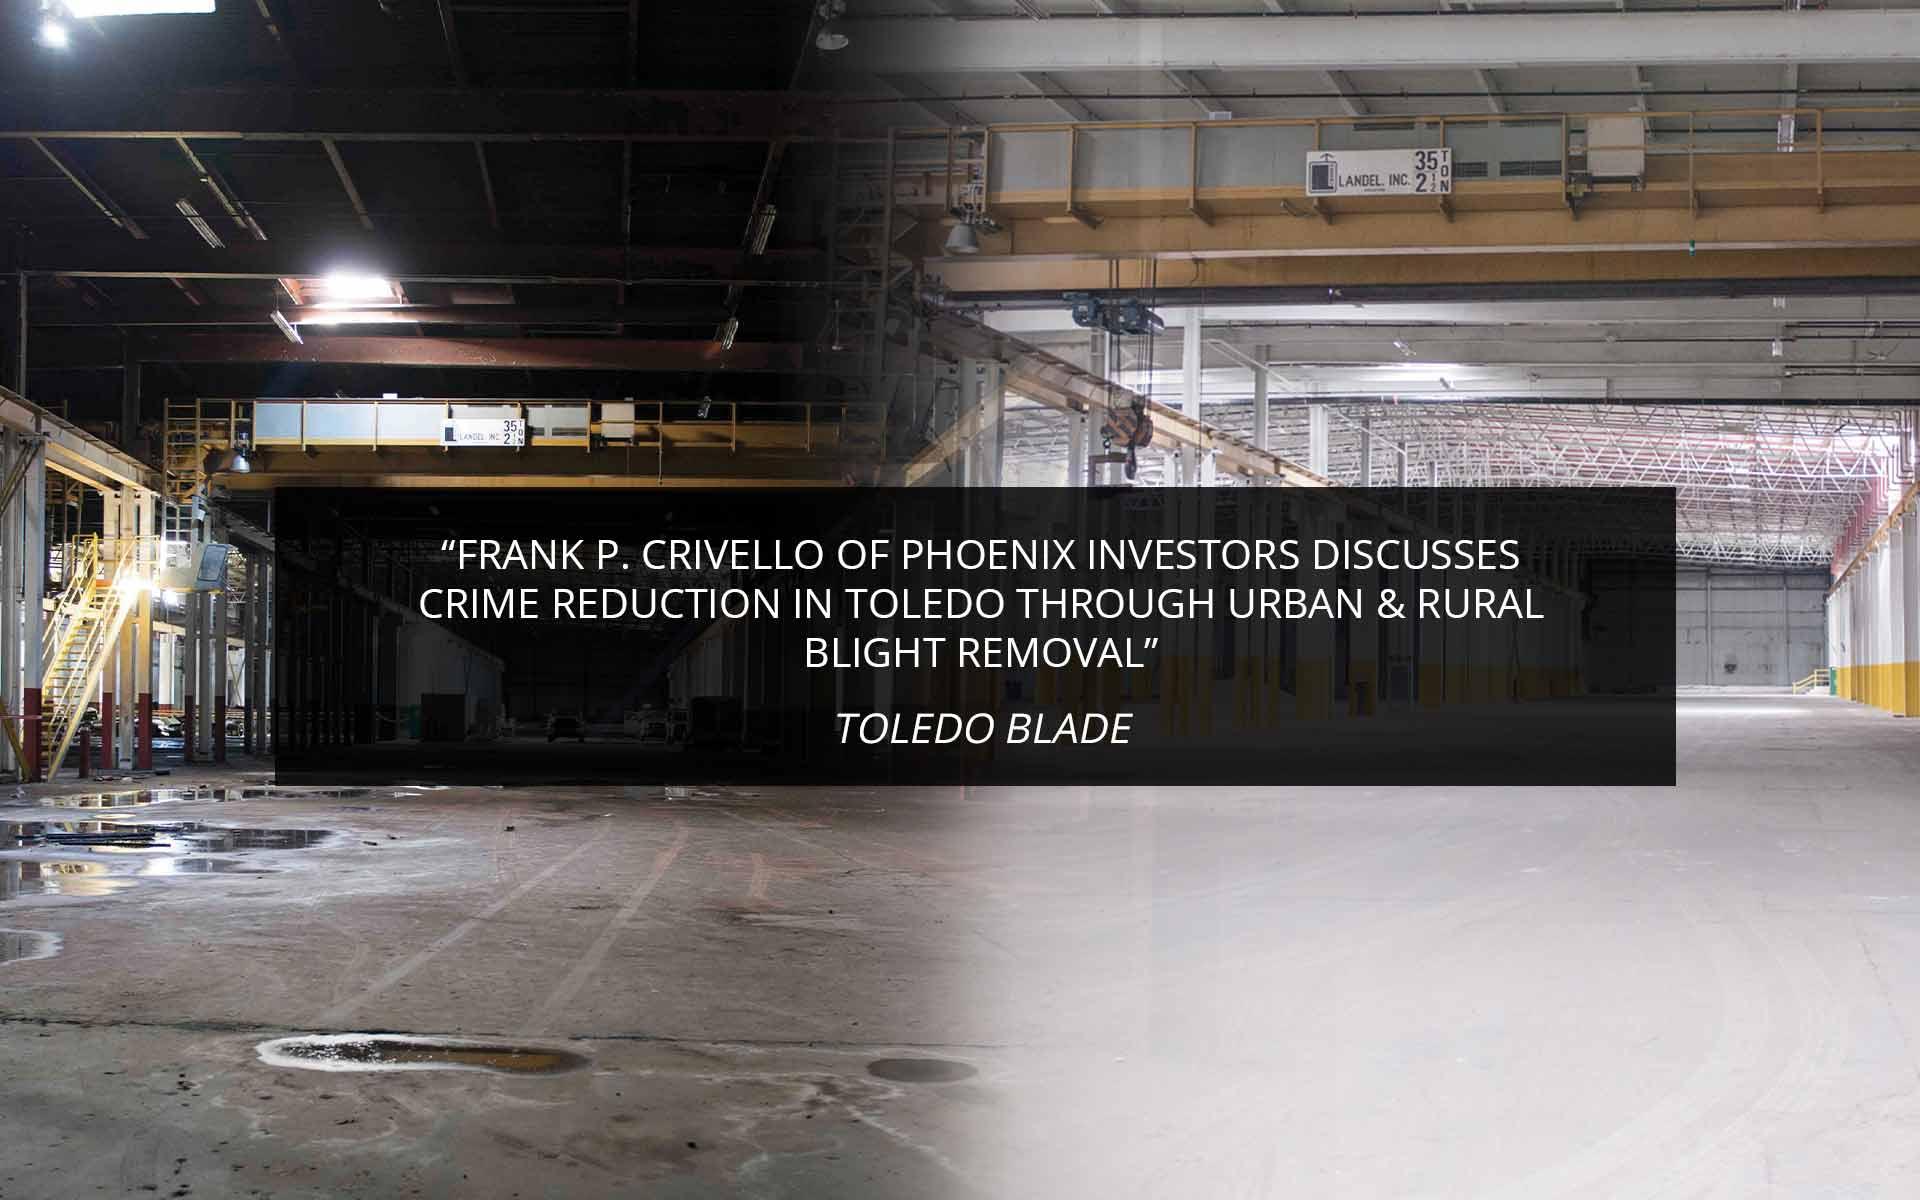 Frank P. Crivello of Phoenix Investors Discusses Crime Reduction in Toledo Through Urban & Rural Blight Removal